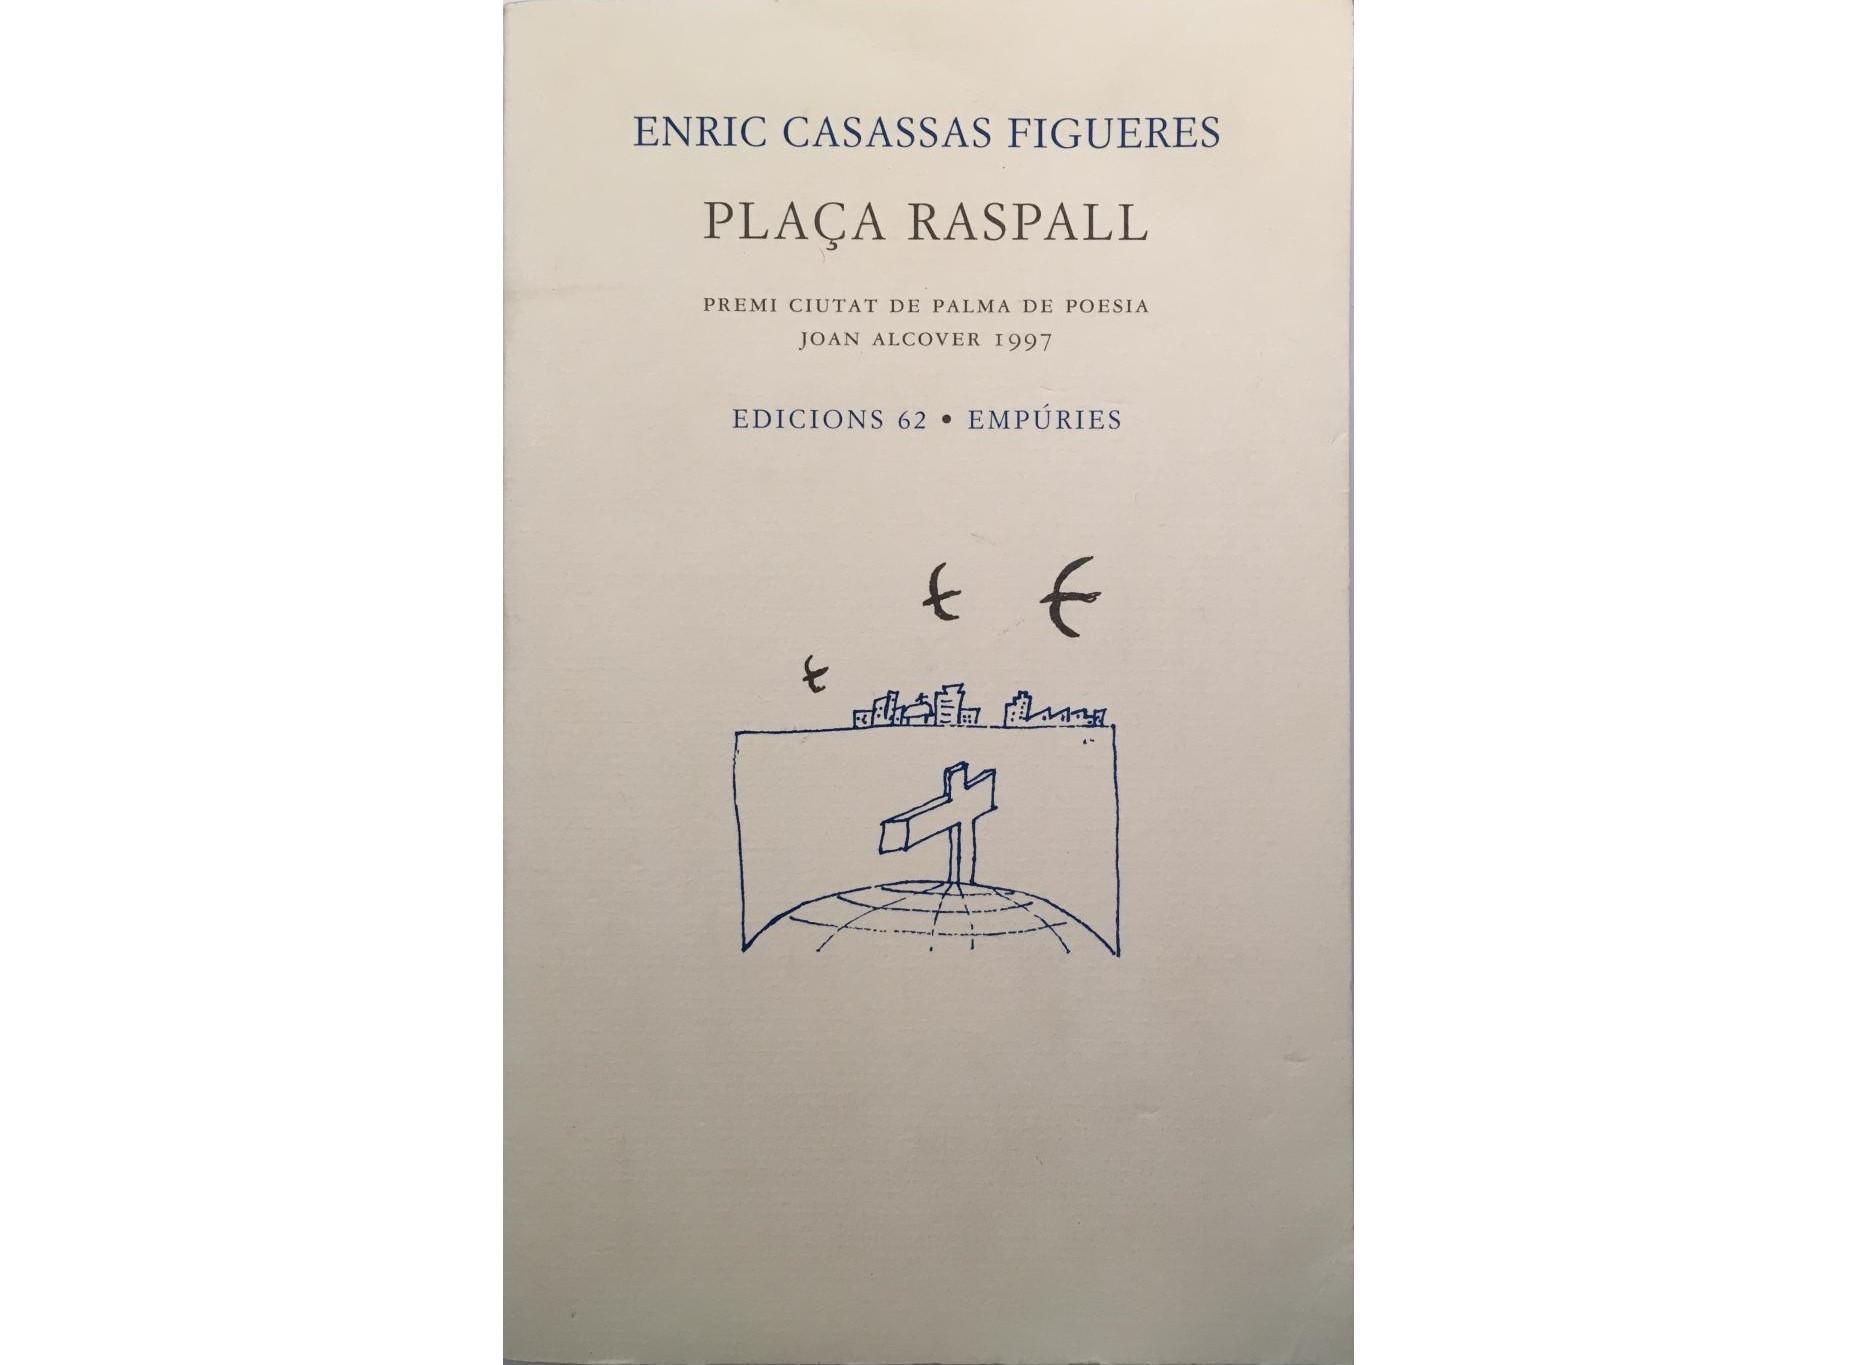 Plaça Raspall